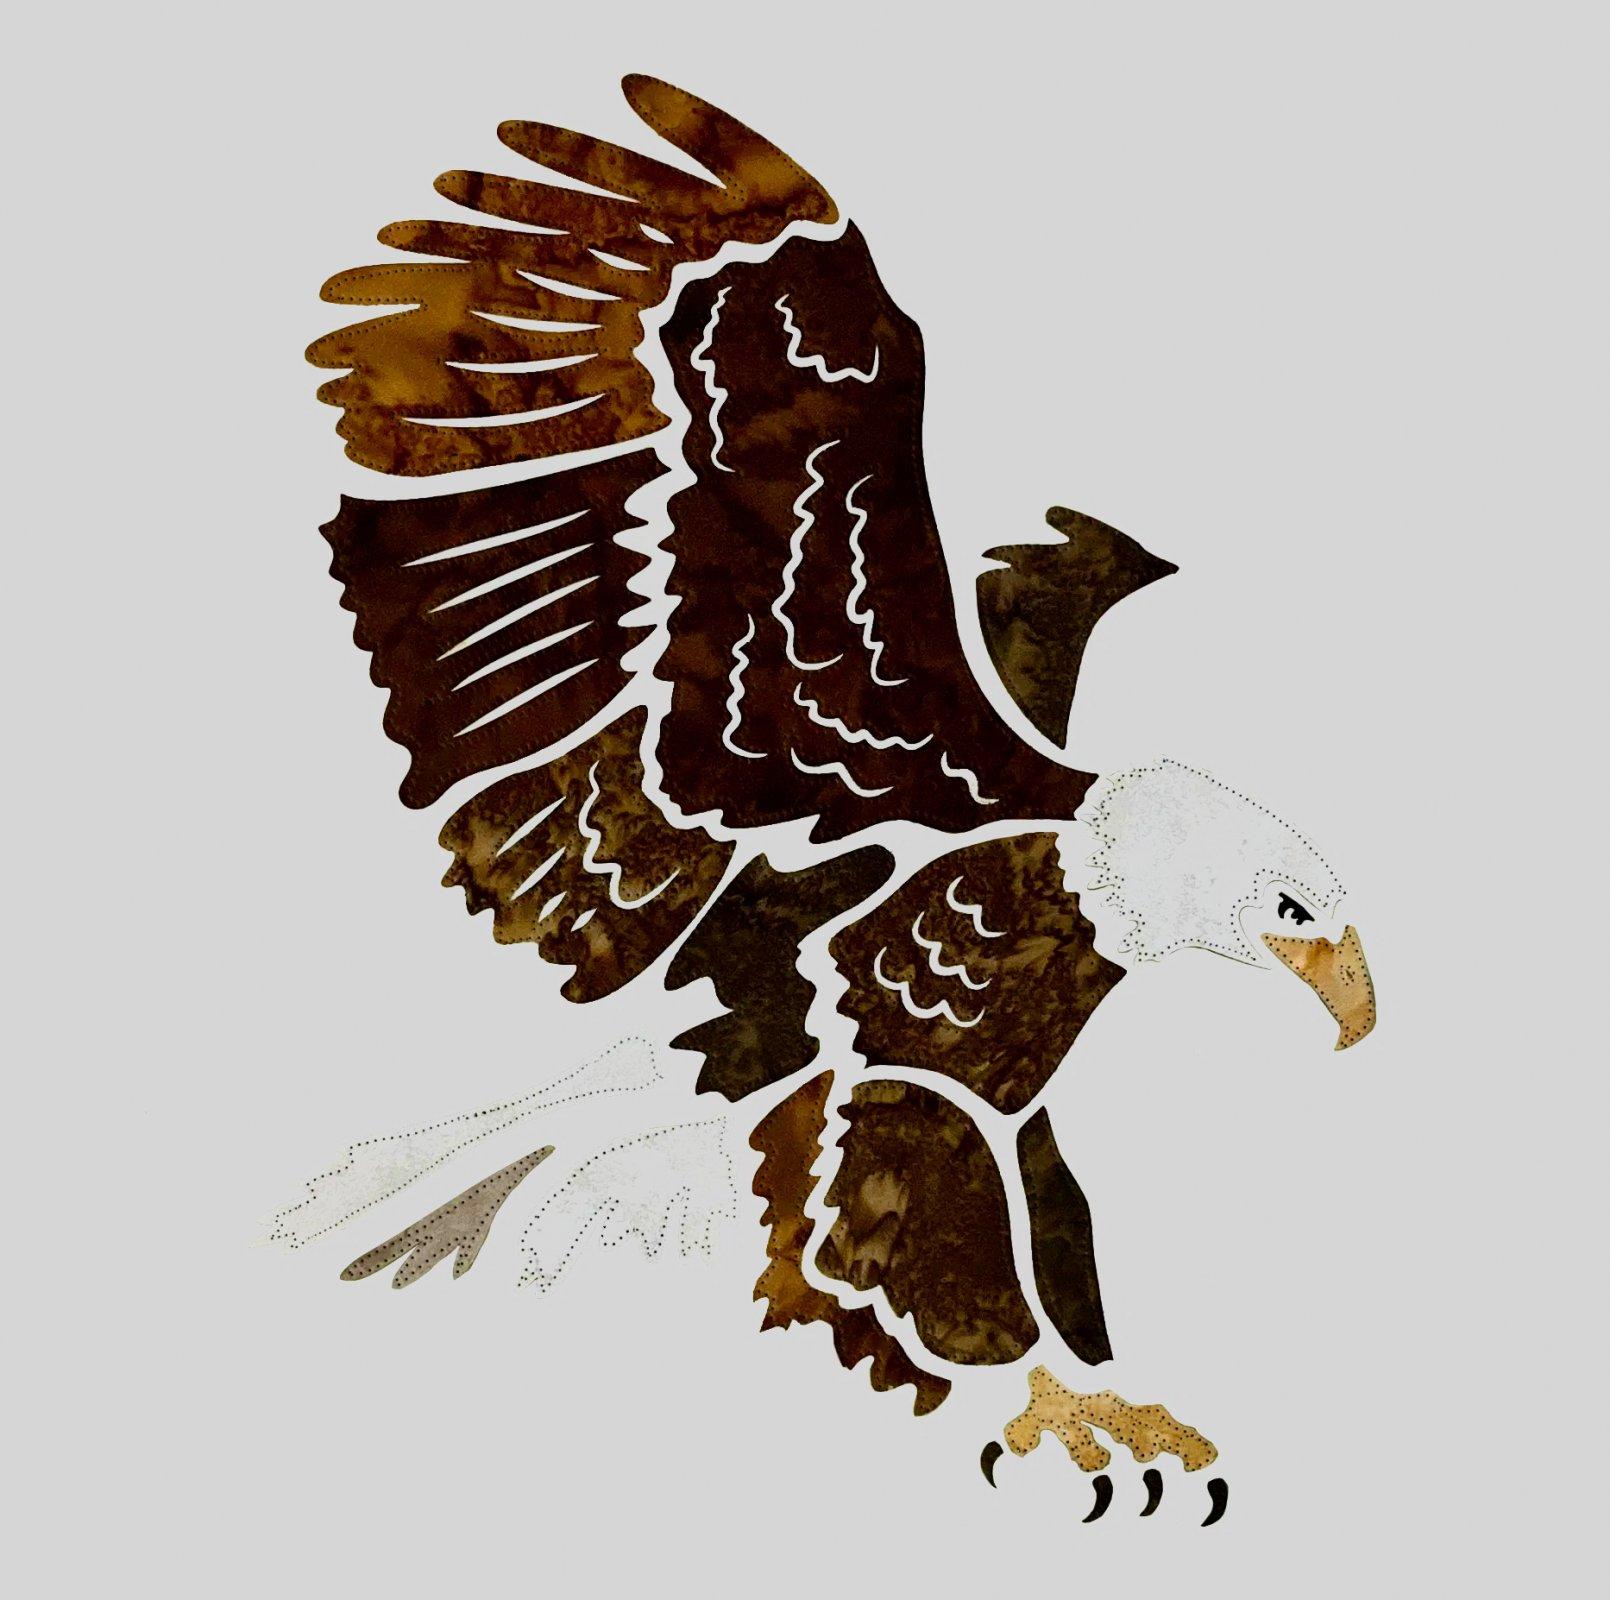 Sew Wild Eagle